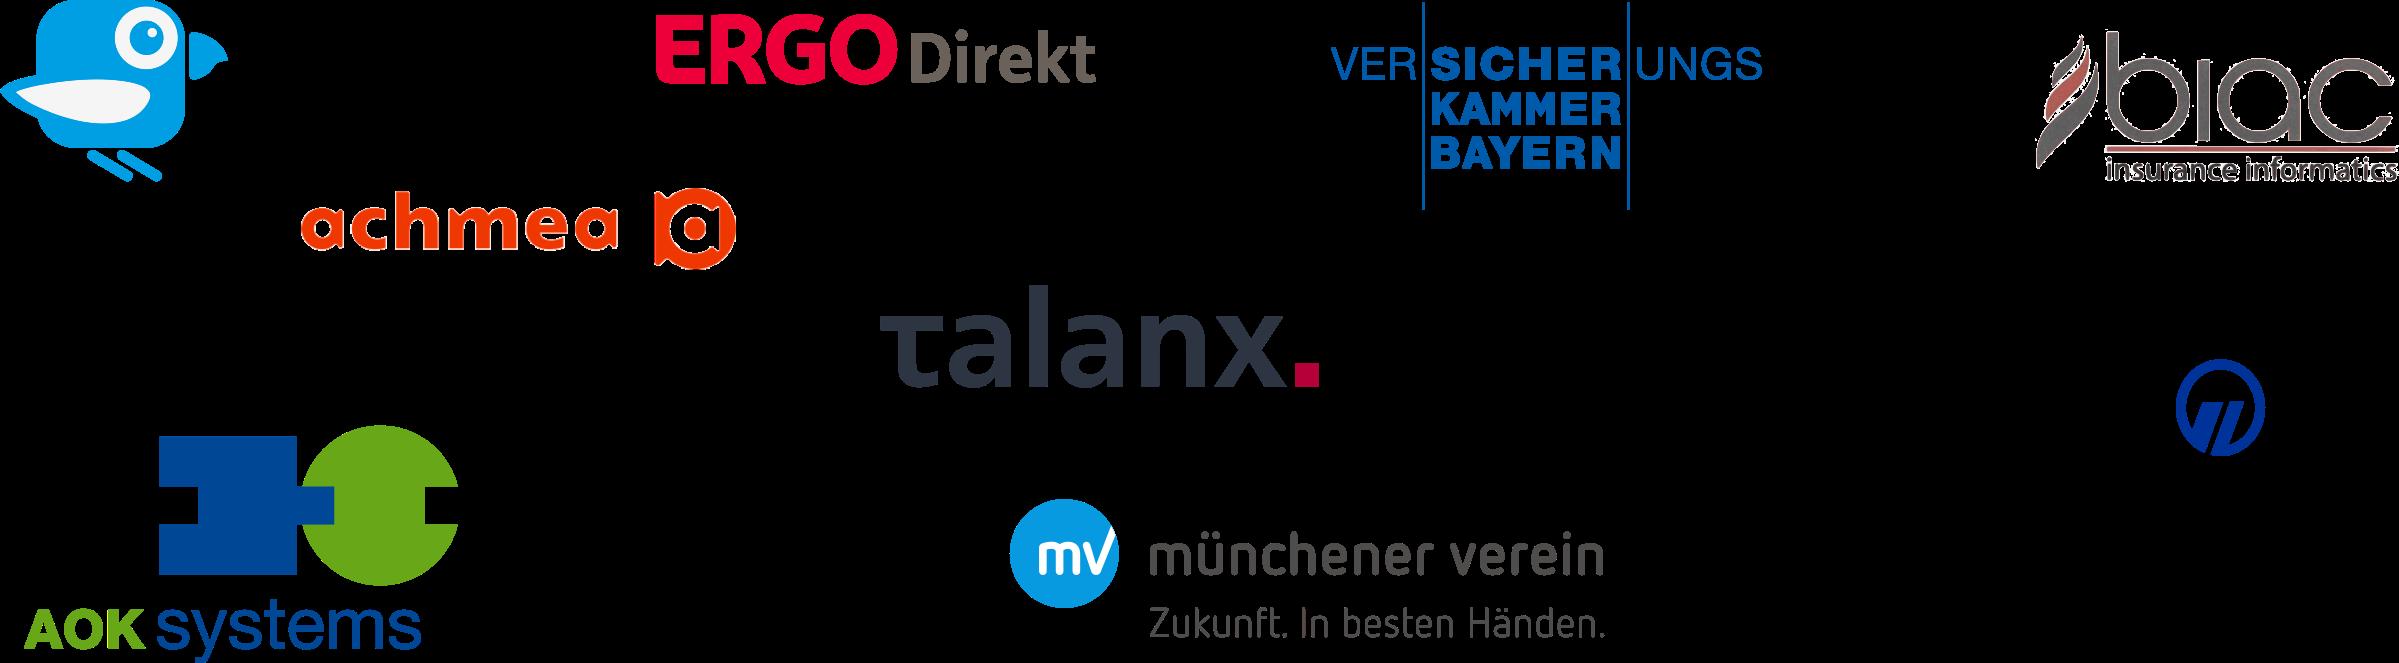 Community Referenzen: AOK, BIAC, Münchener Verein, Signal Iduna, Talanx, Achmea, ERGO Direkt